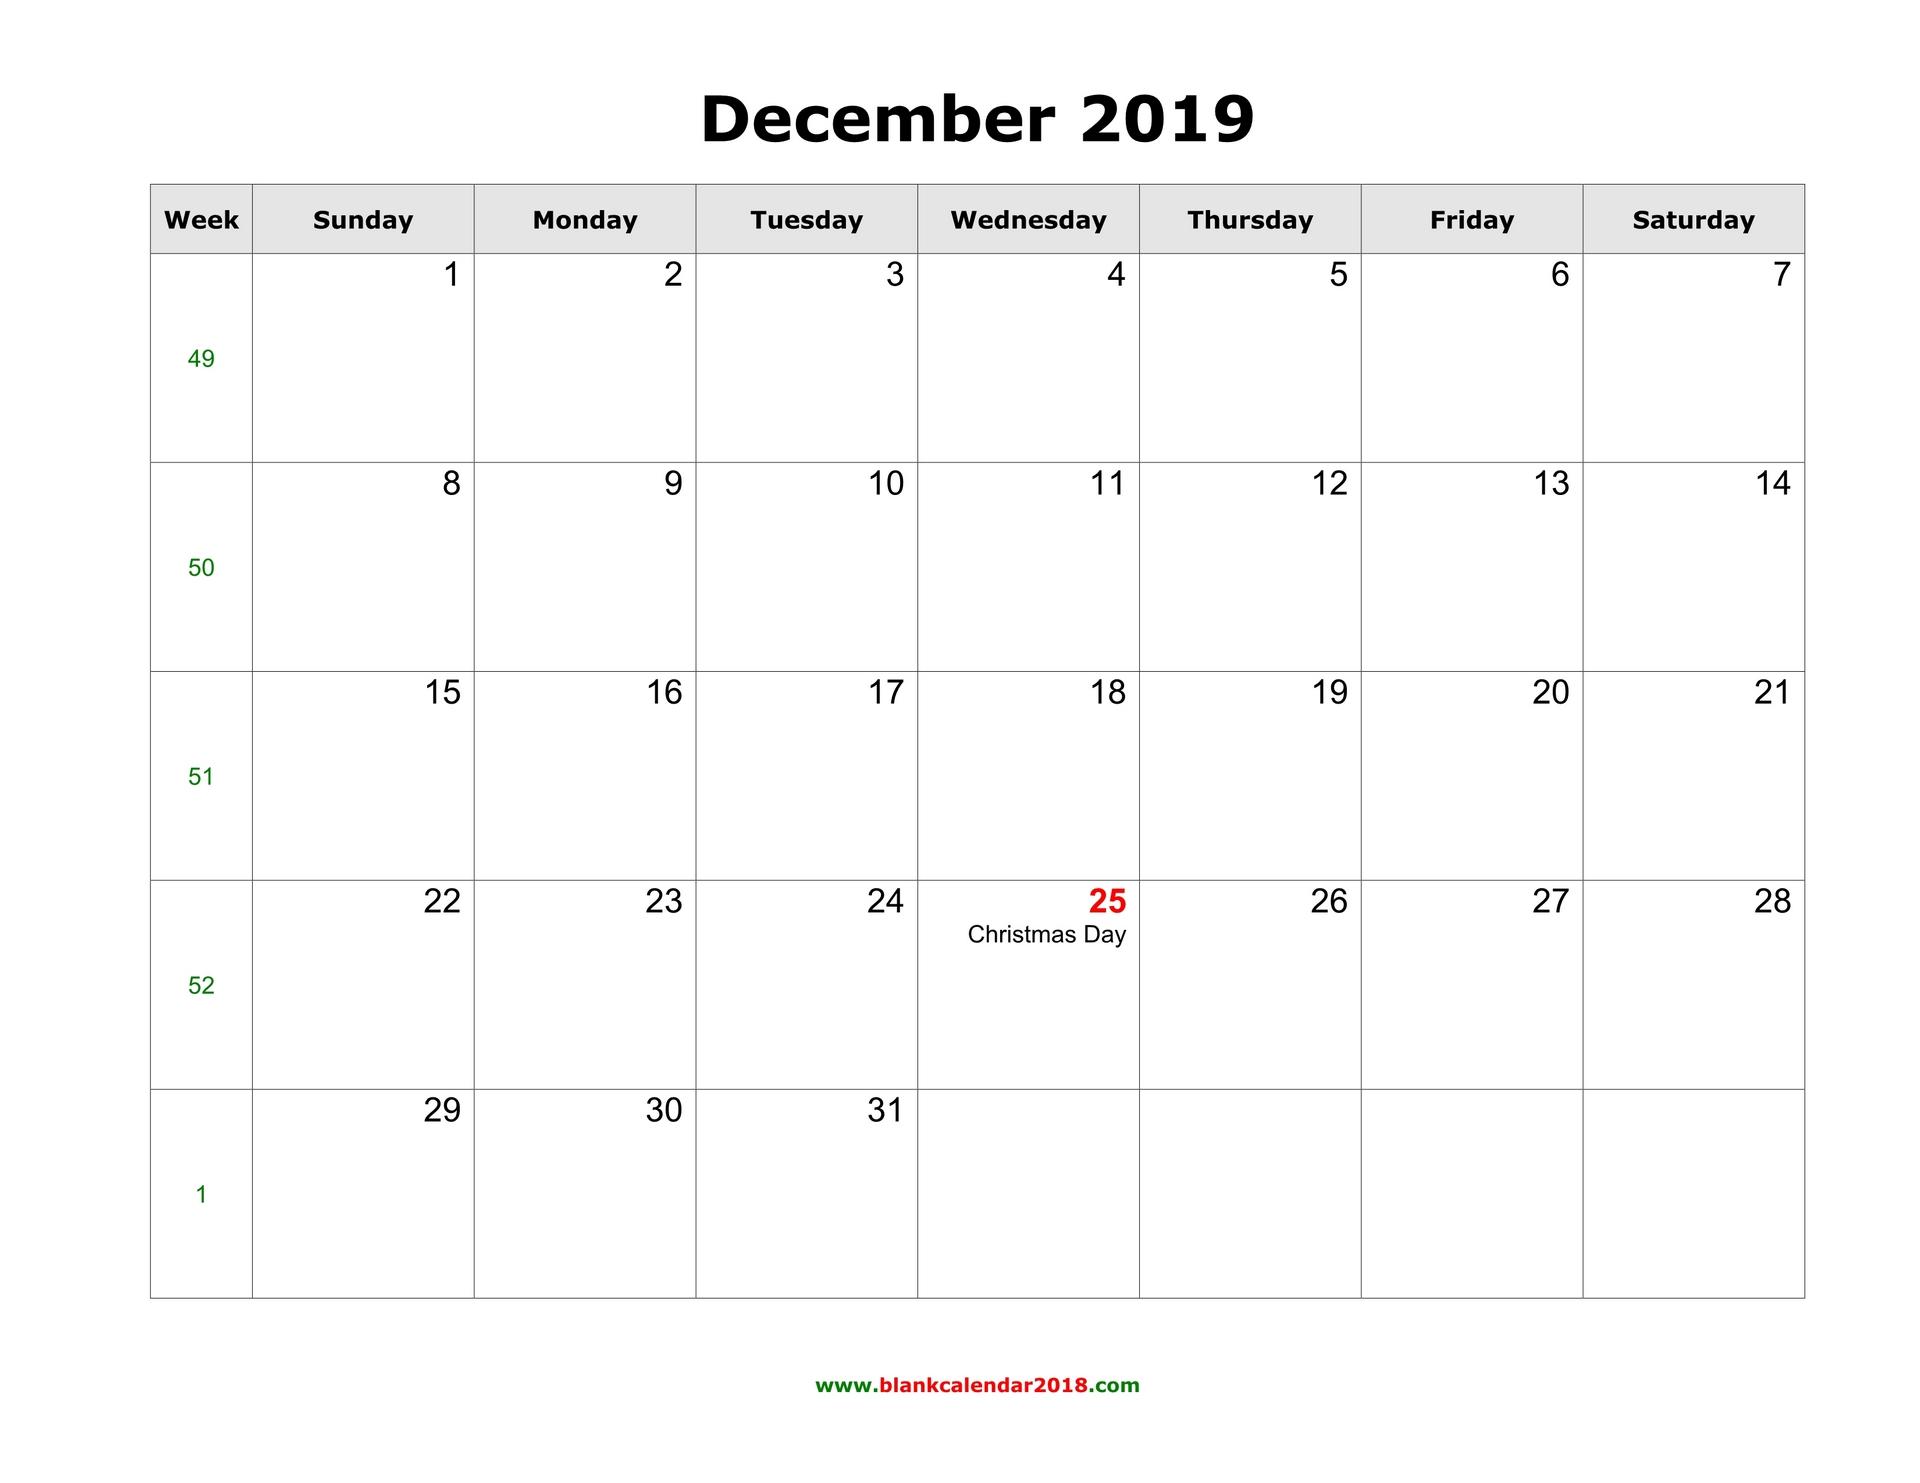 Blank Calendar For December 2019 throughout August - December Blank Calendar